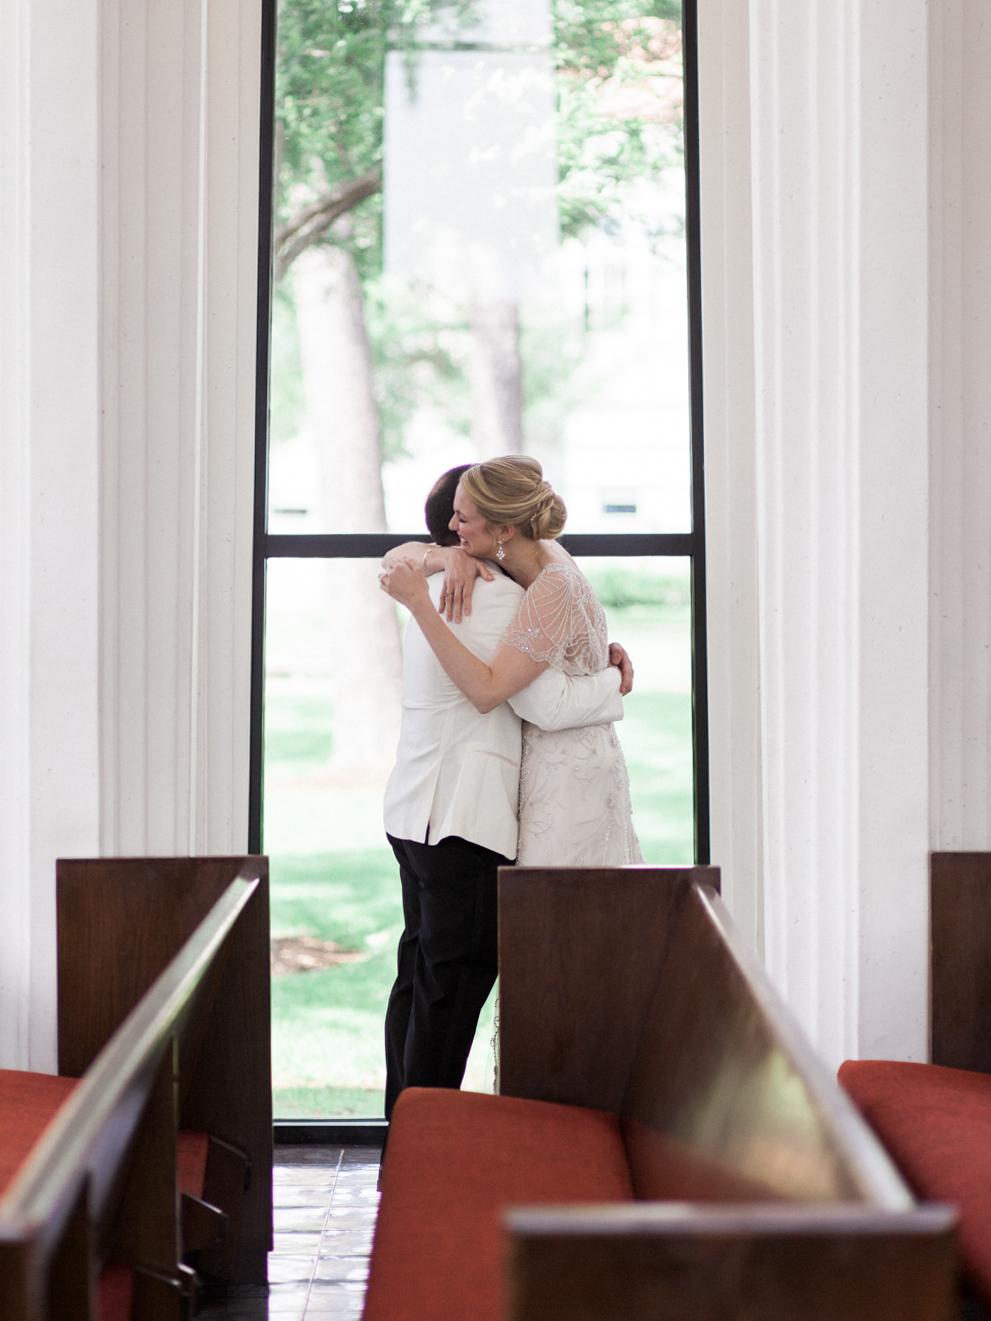 benefits of a first look_wedding photography_wedding photographer_film wedding photographer_Christine Gosch_www.christinegosch.com_Houston, Texas wedding photographer_ Houston, Texas-22.jpg